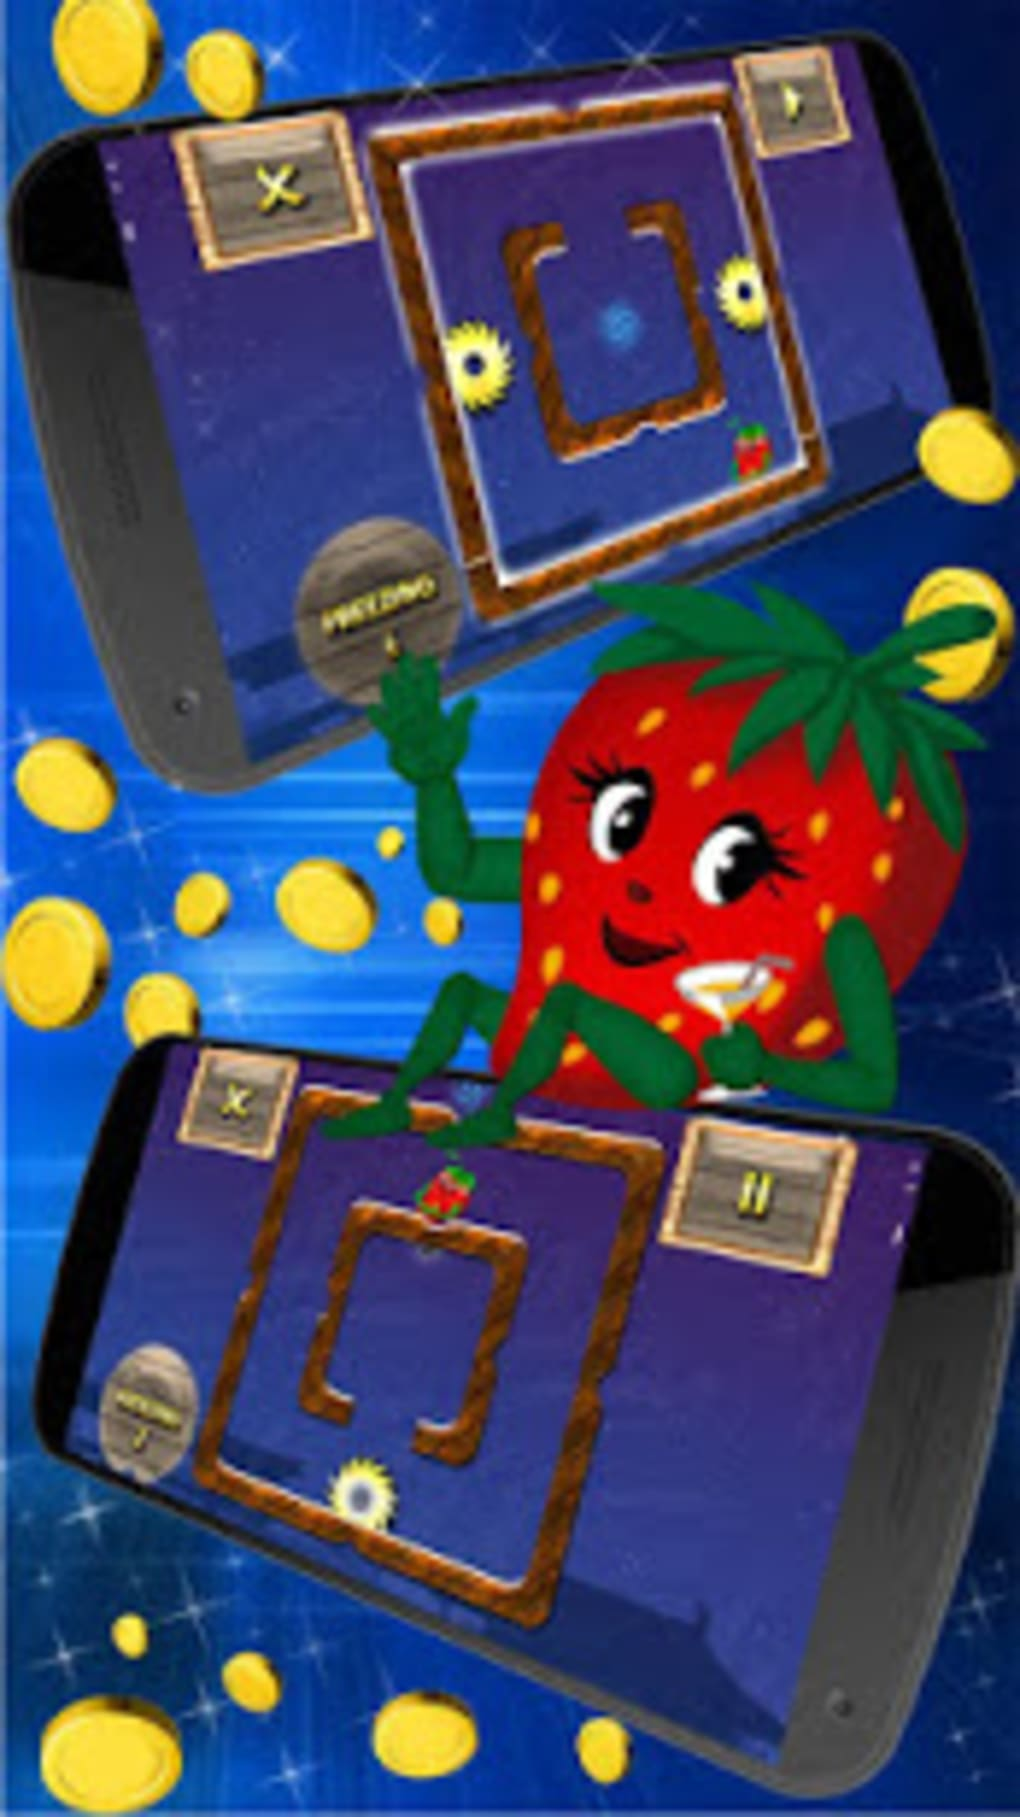 Hacker программы для онлайн казино